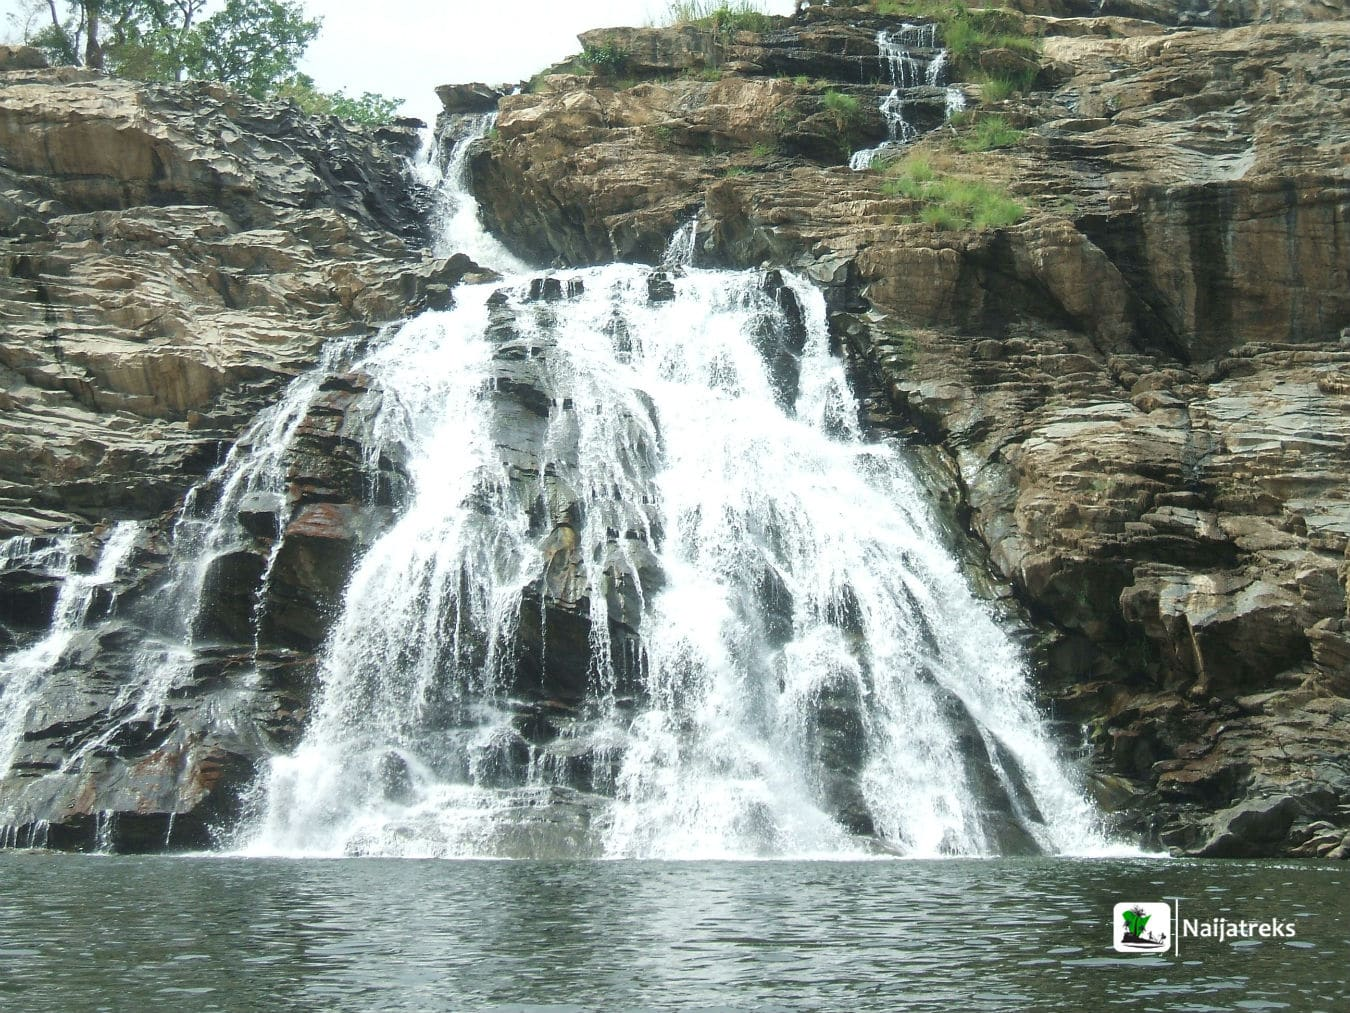 Niger Falls